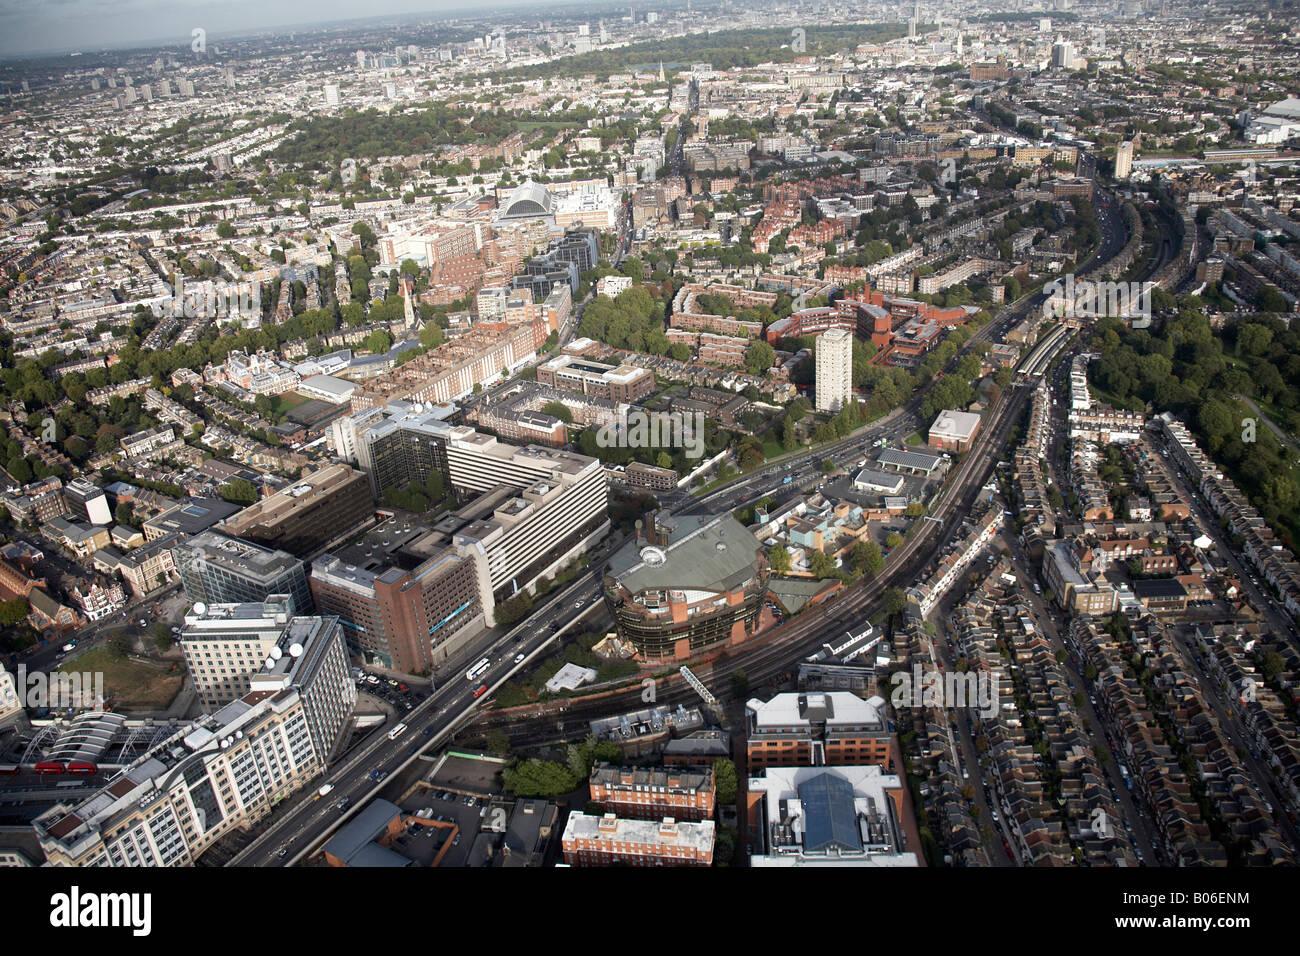 Aerial view north east of Hotel Novotel West London Ark Talgarth Road Hammersmith Flyover suburban buildings Kensington Stock Photo